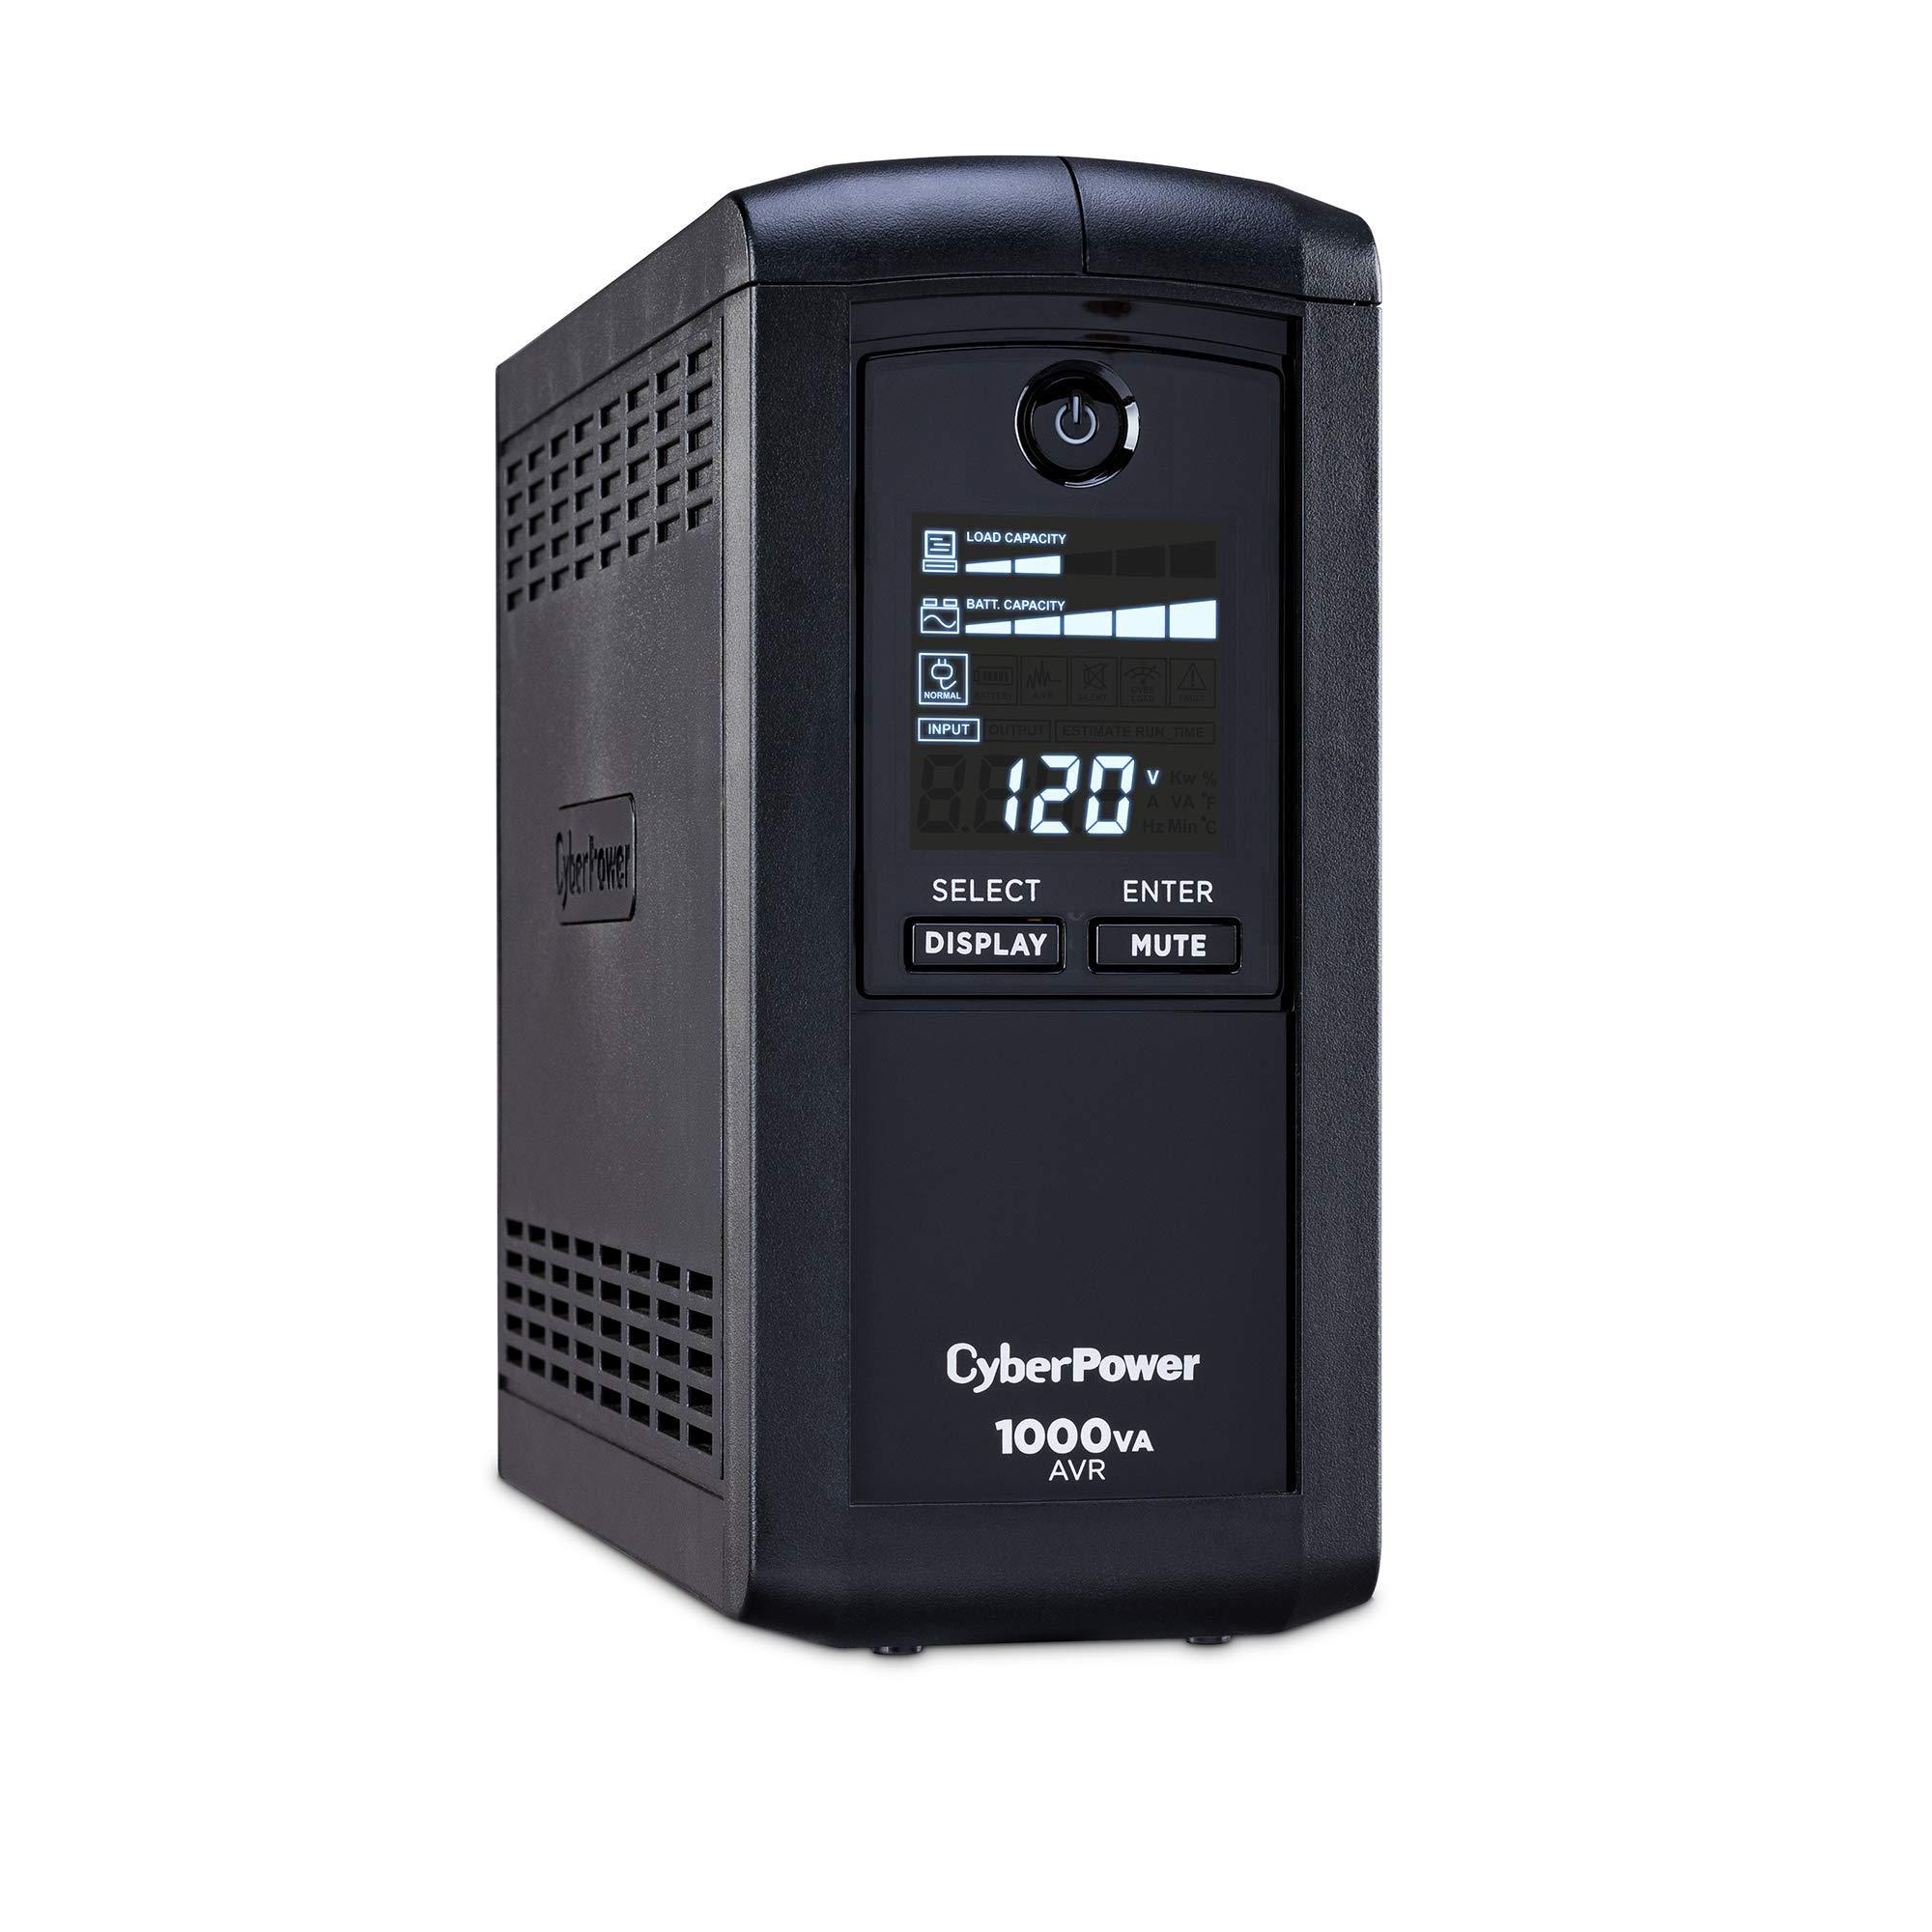 CyberPower CP1000AVRLCD Intelligent LCD UPS System, 1000VA/600W, 9 Outlets, AVR, Mini-Tower, Black